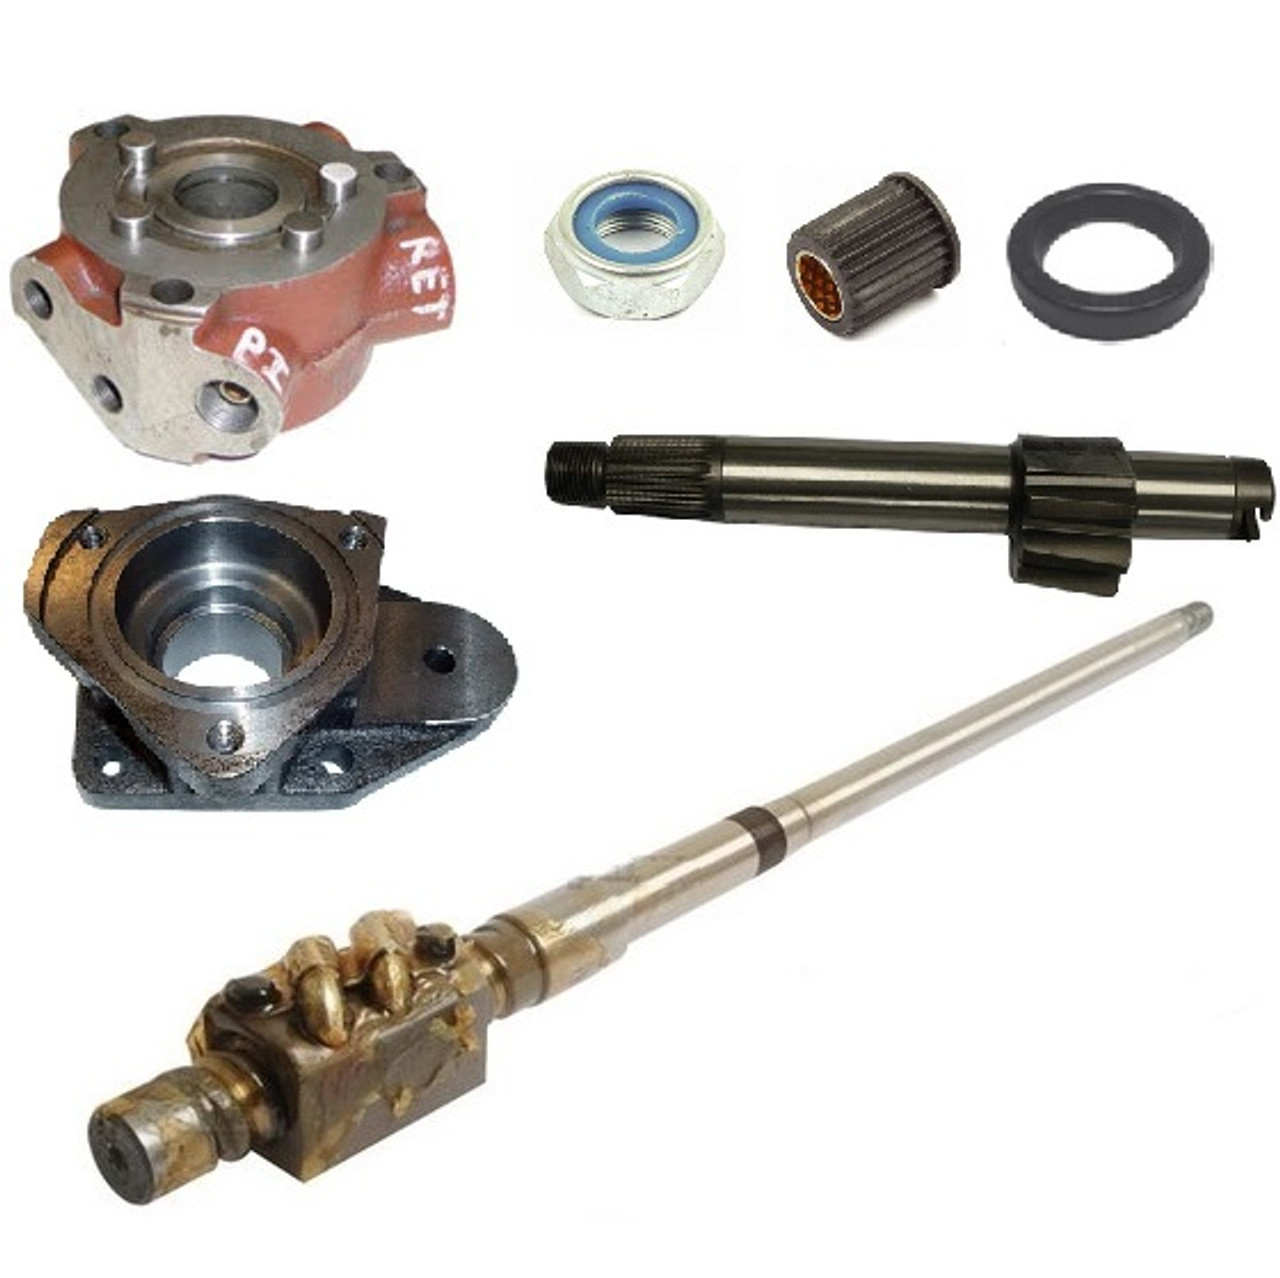 Steering Gearbox and Parts (Power Steering)